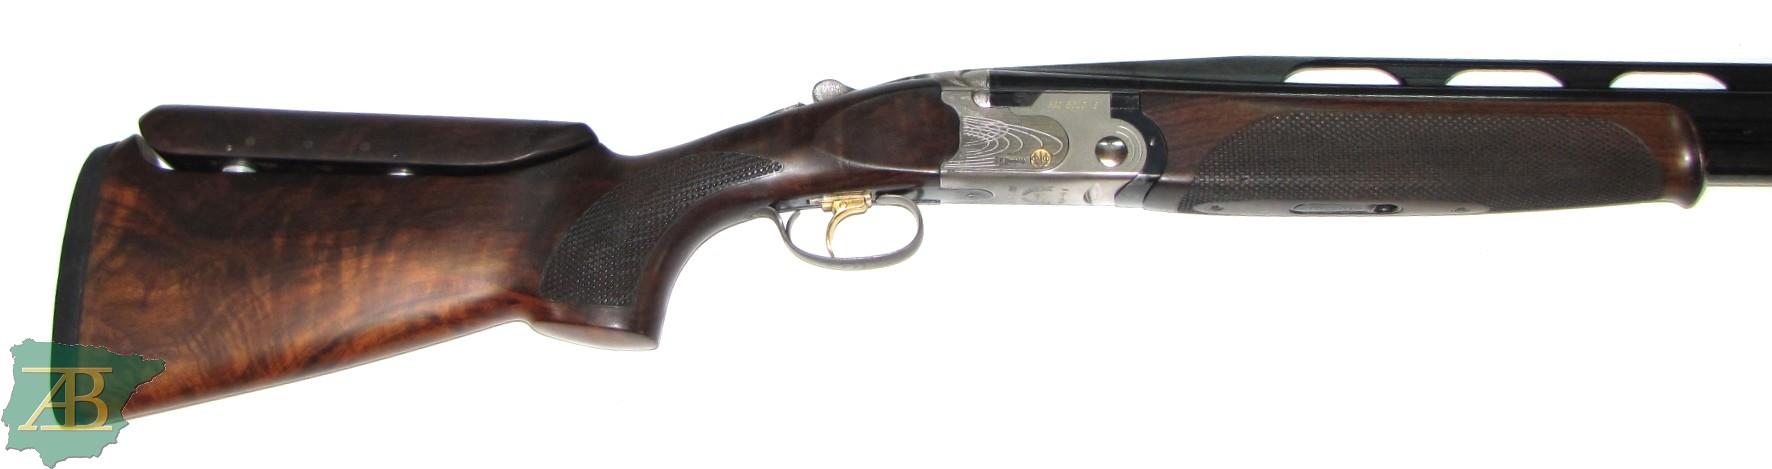 Escopeta superpuesta de TRAP BERETTA 682 GOLD E Ref 5779-armeriaiberica-2